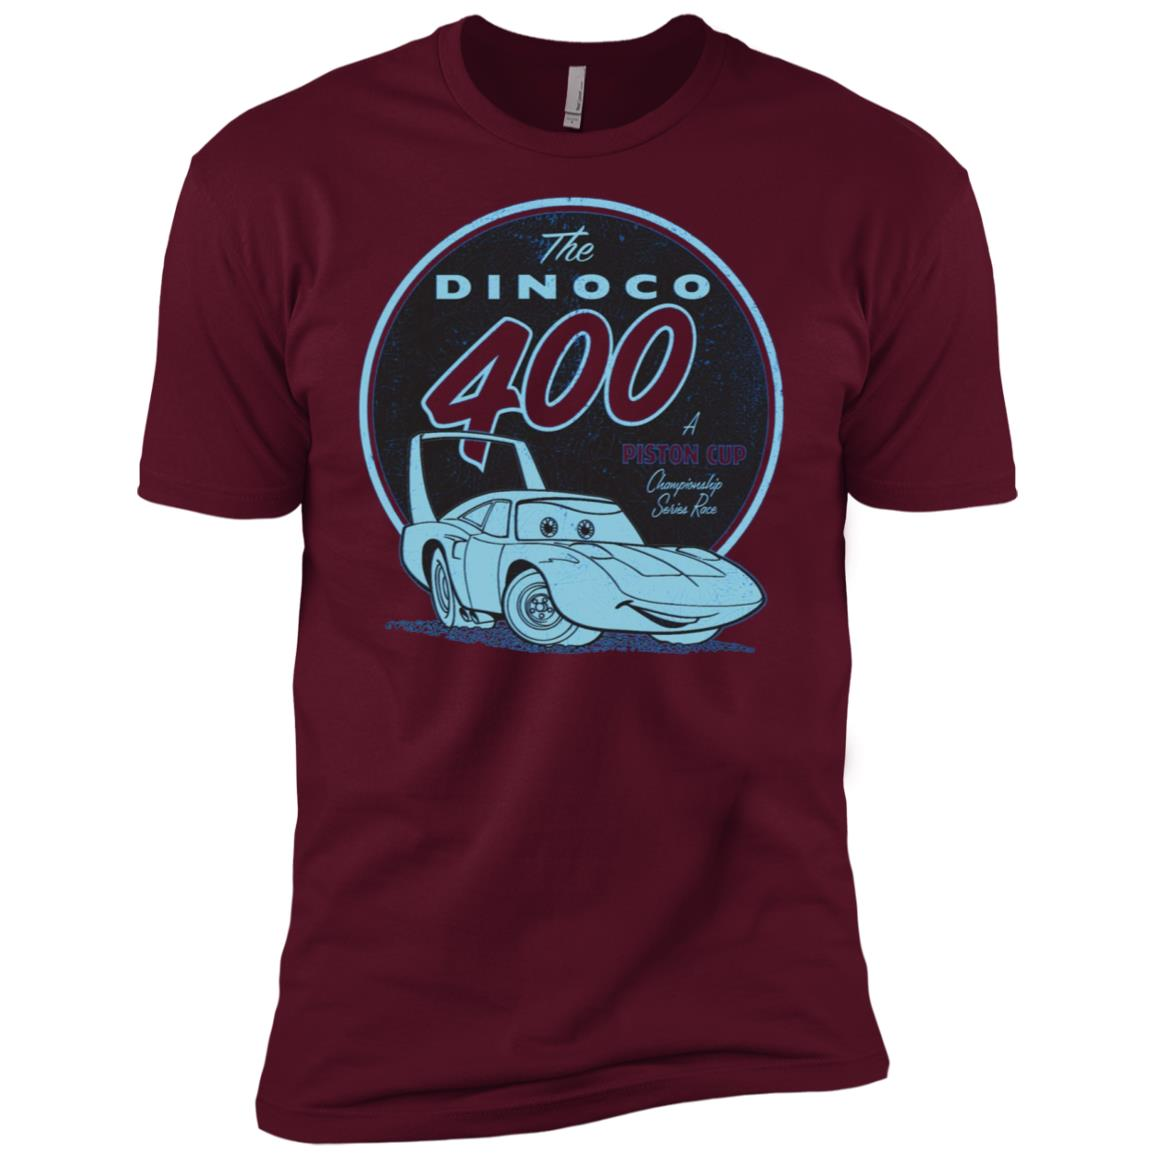 Disney Pixar Cars The King Dinoco 400 Series Graphic Men Short Sleeve T-Shirt